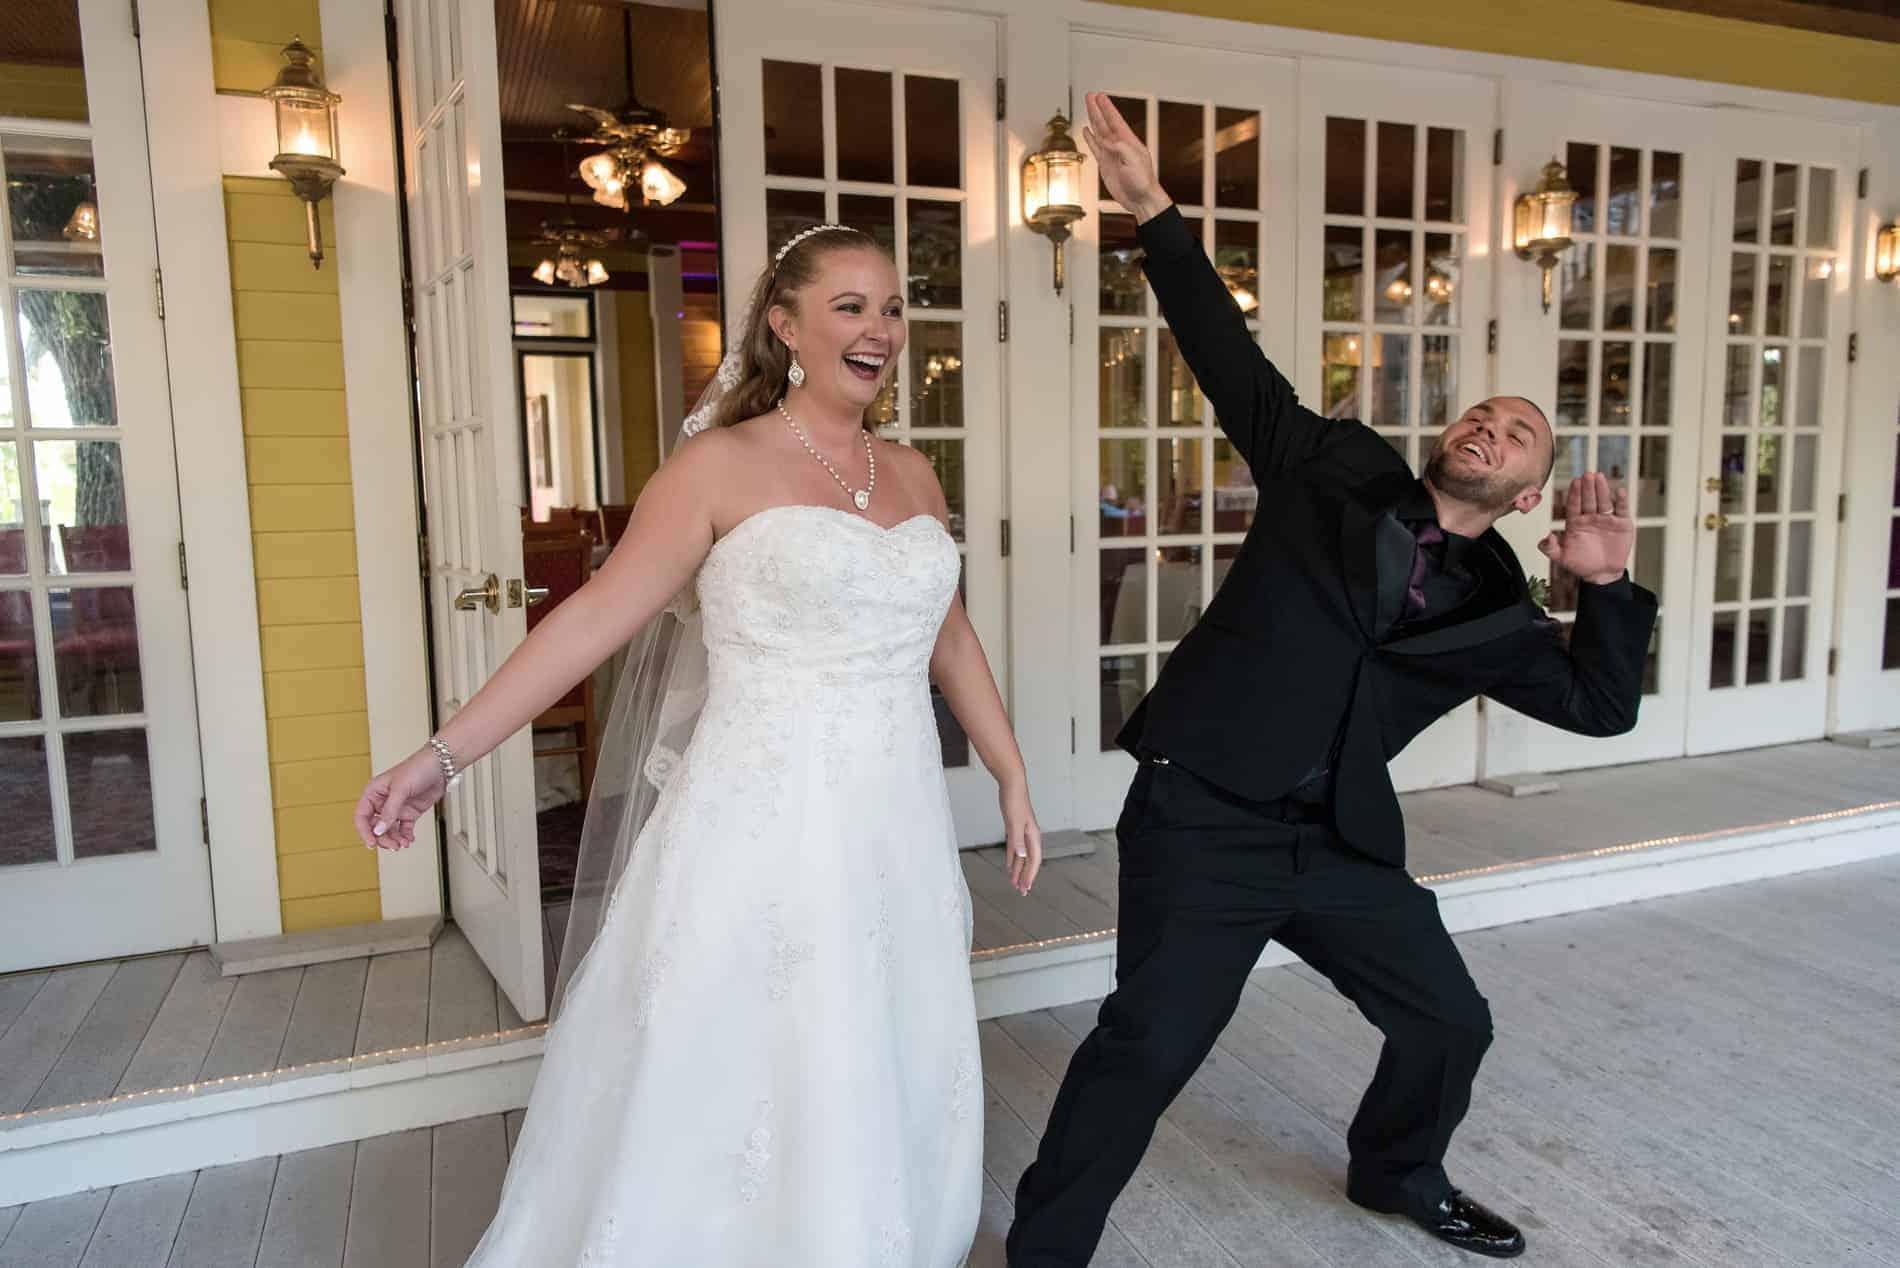 Top Outdoor Wedding Ceremony Locations